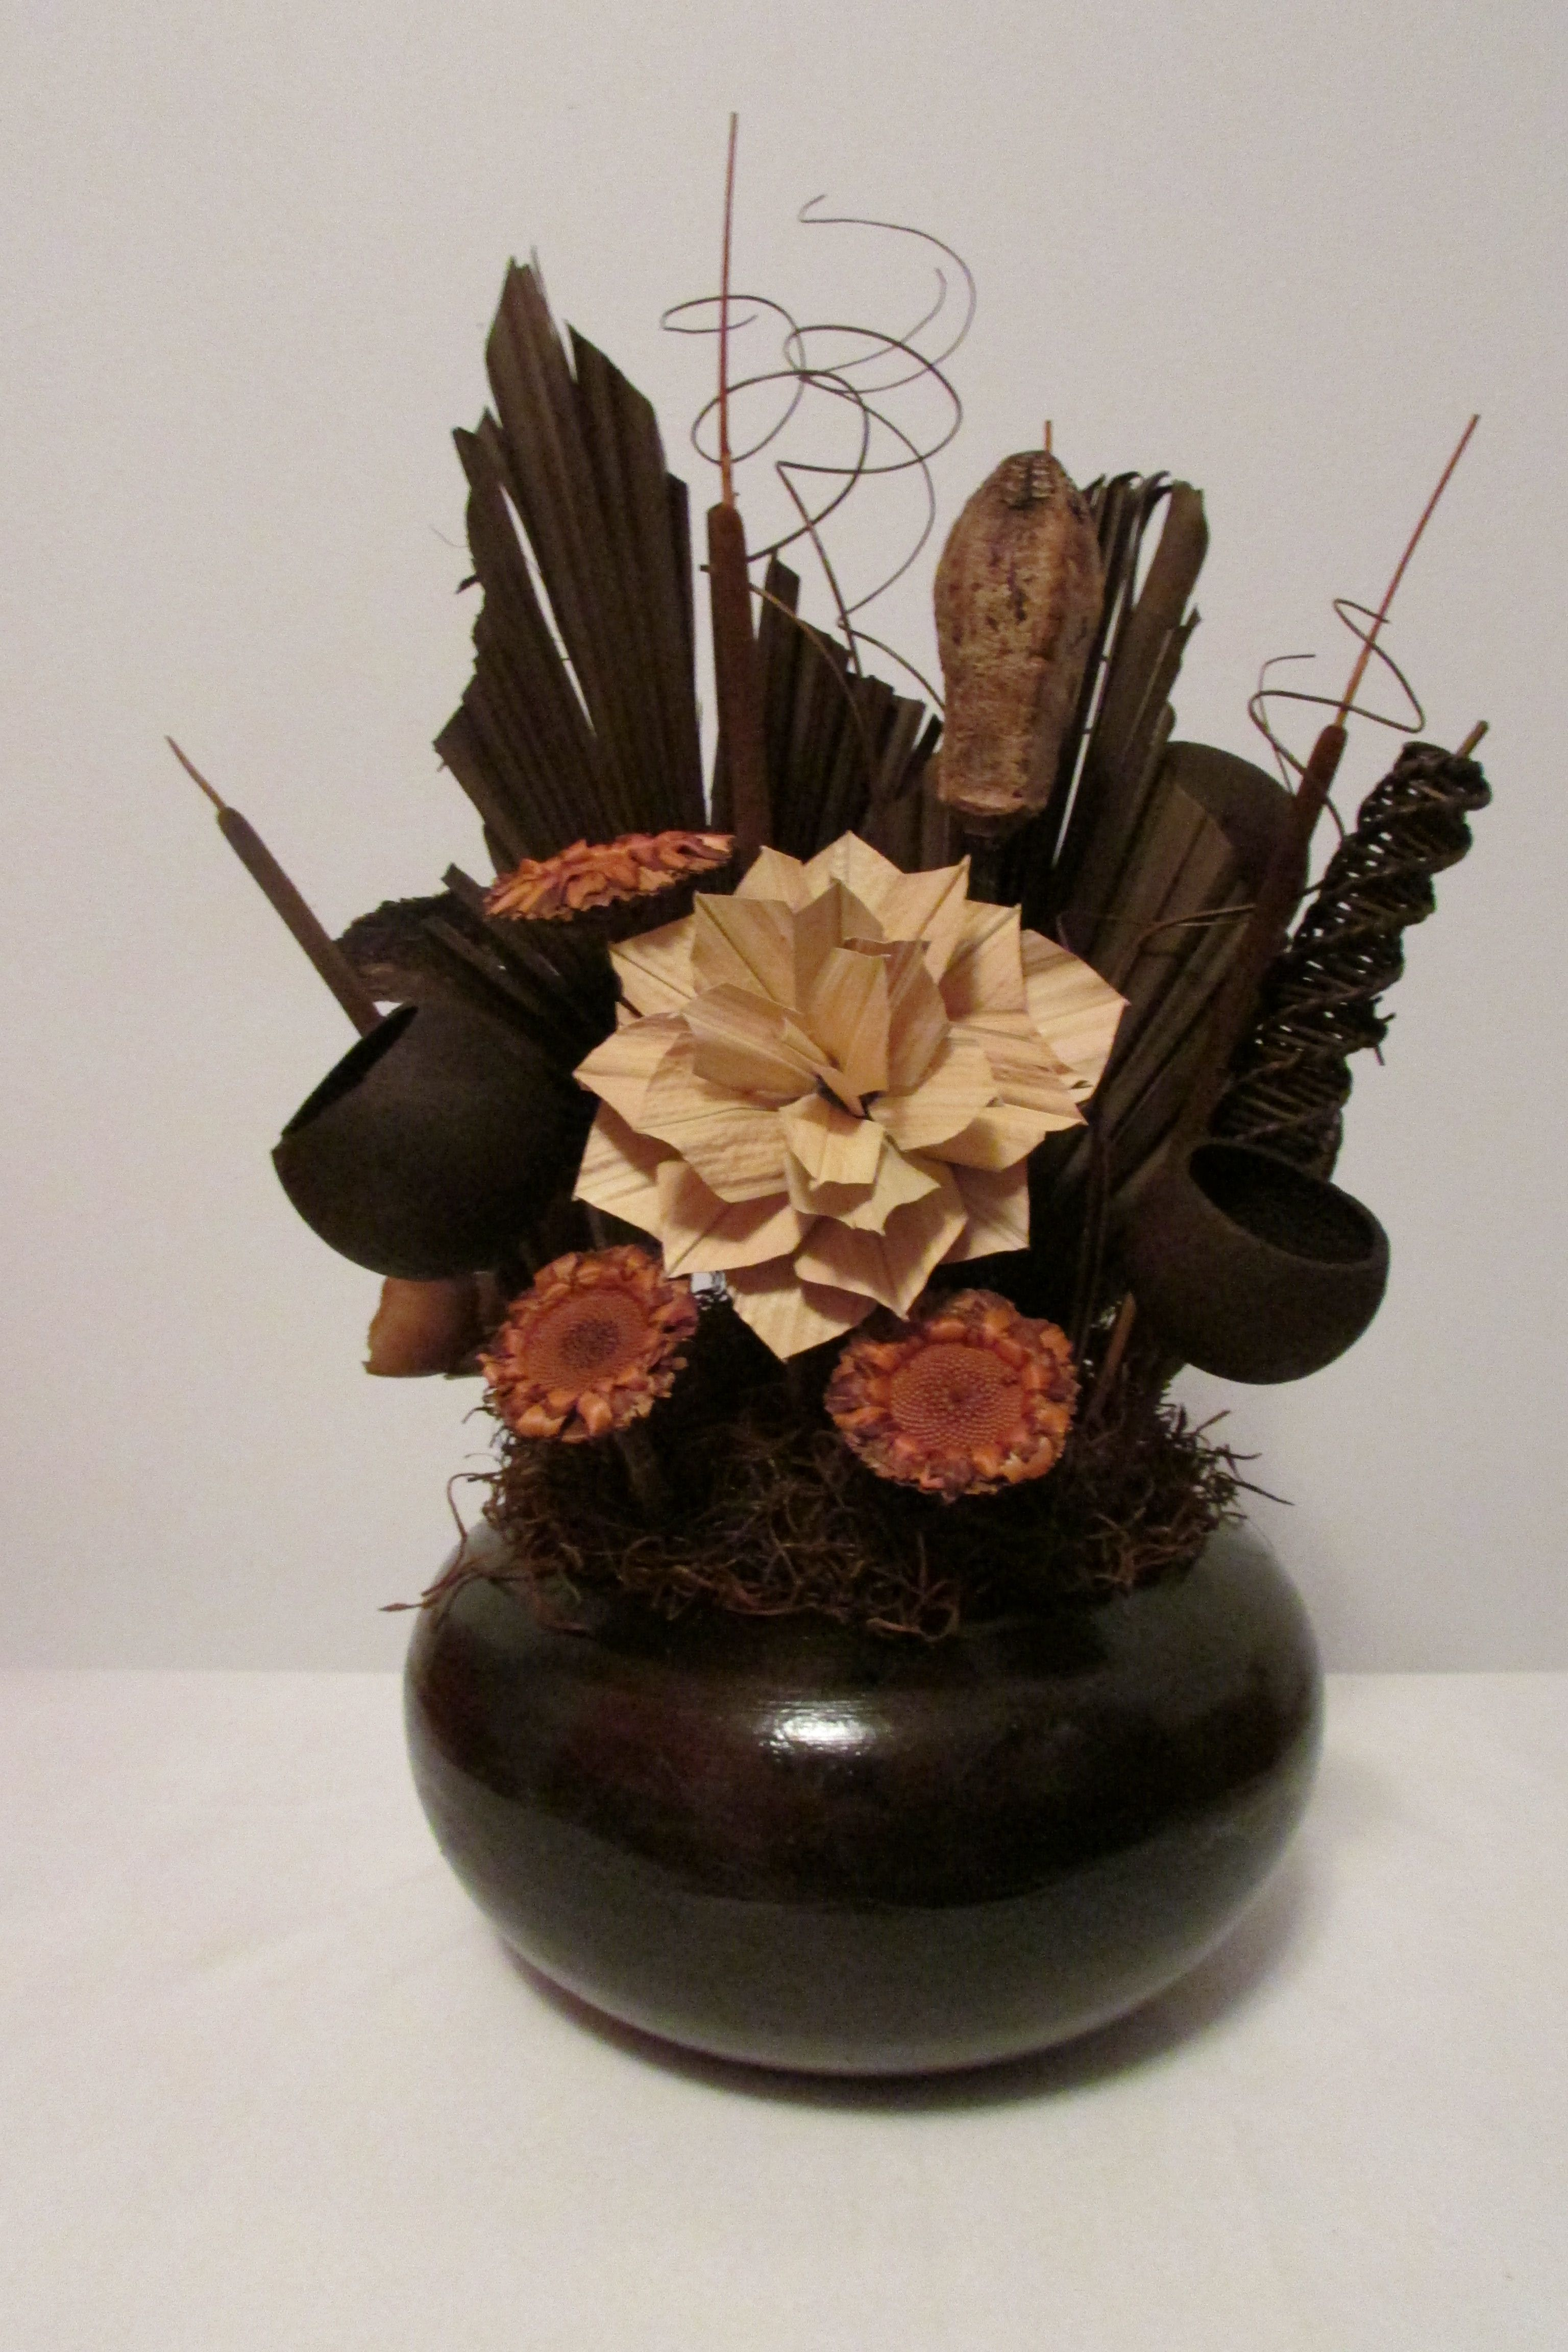 Arcadia Floral And Home Decor Dry Decoration Arrangements My Web Value